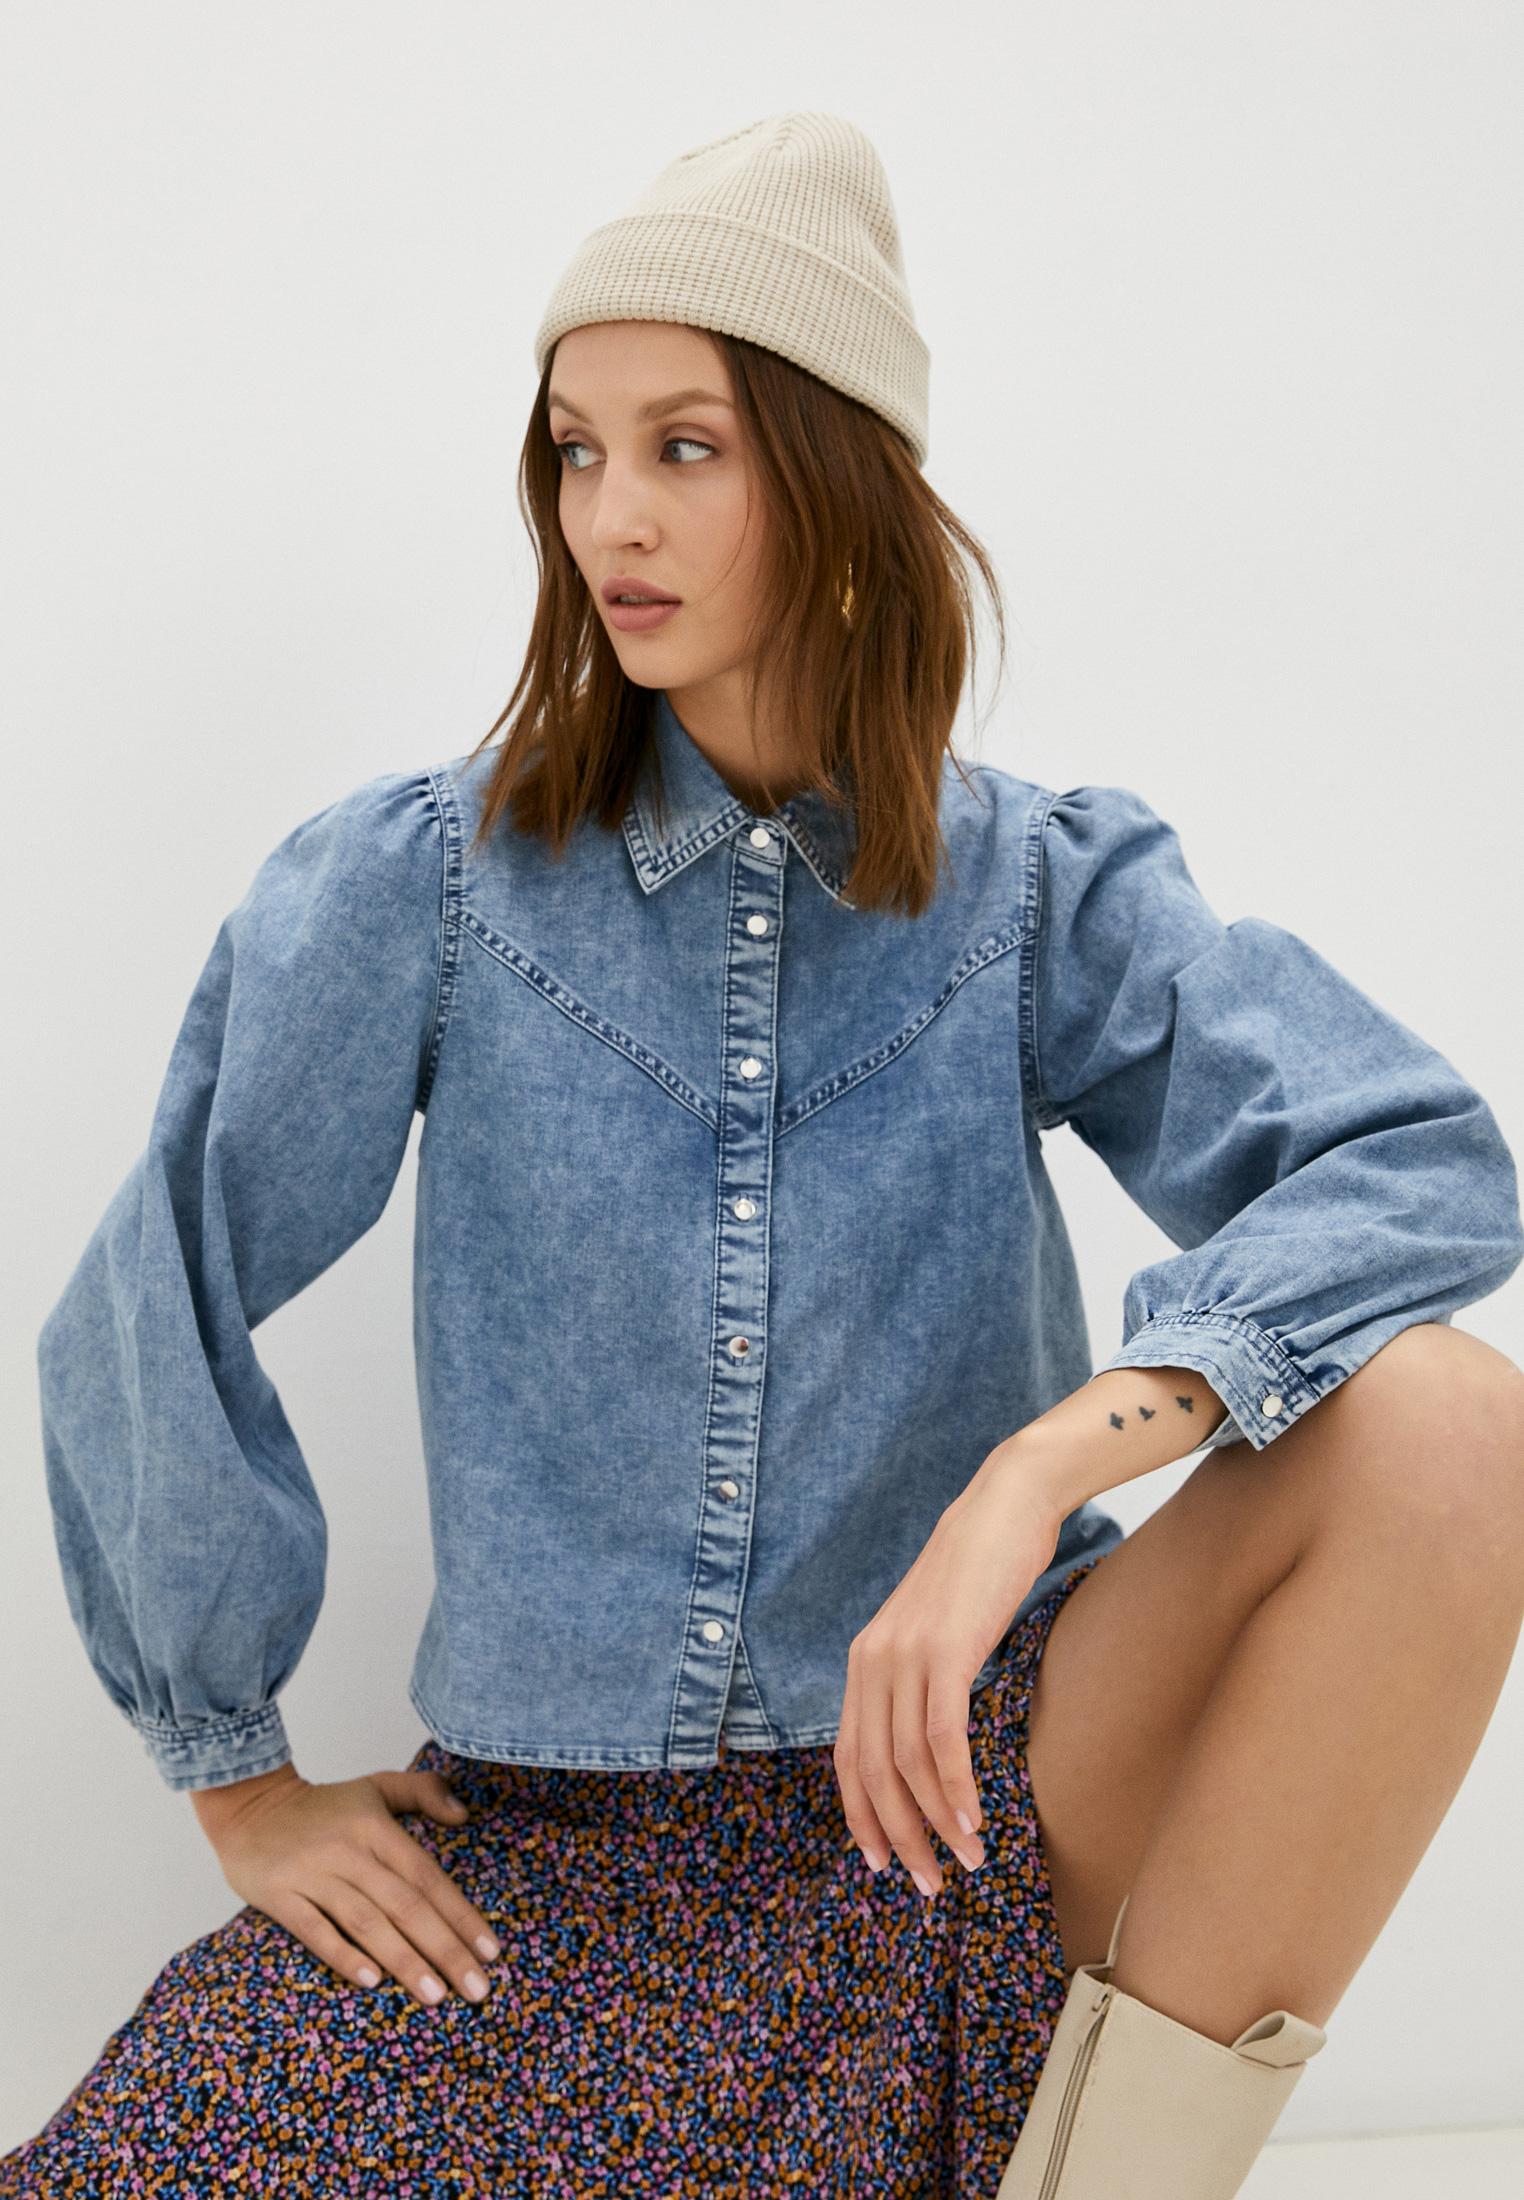 Женские рубашки с длинным рукавом Pimkie Рубашка джинсовая Pimkie